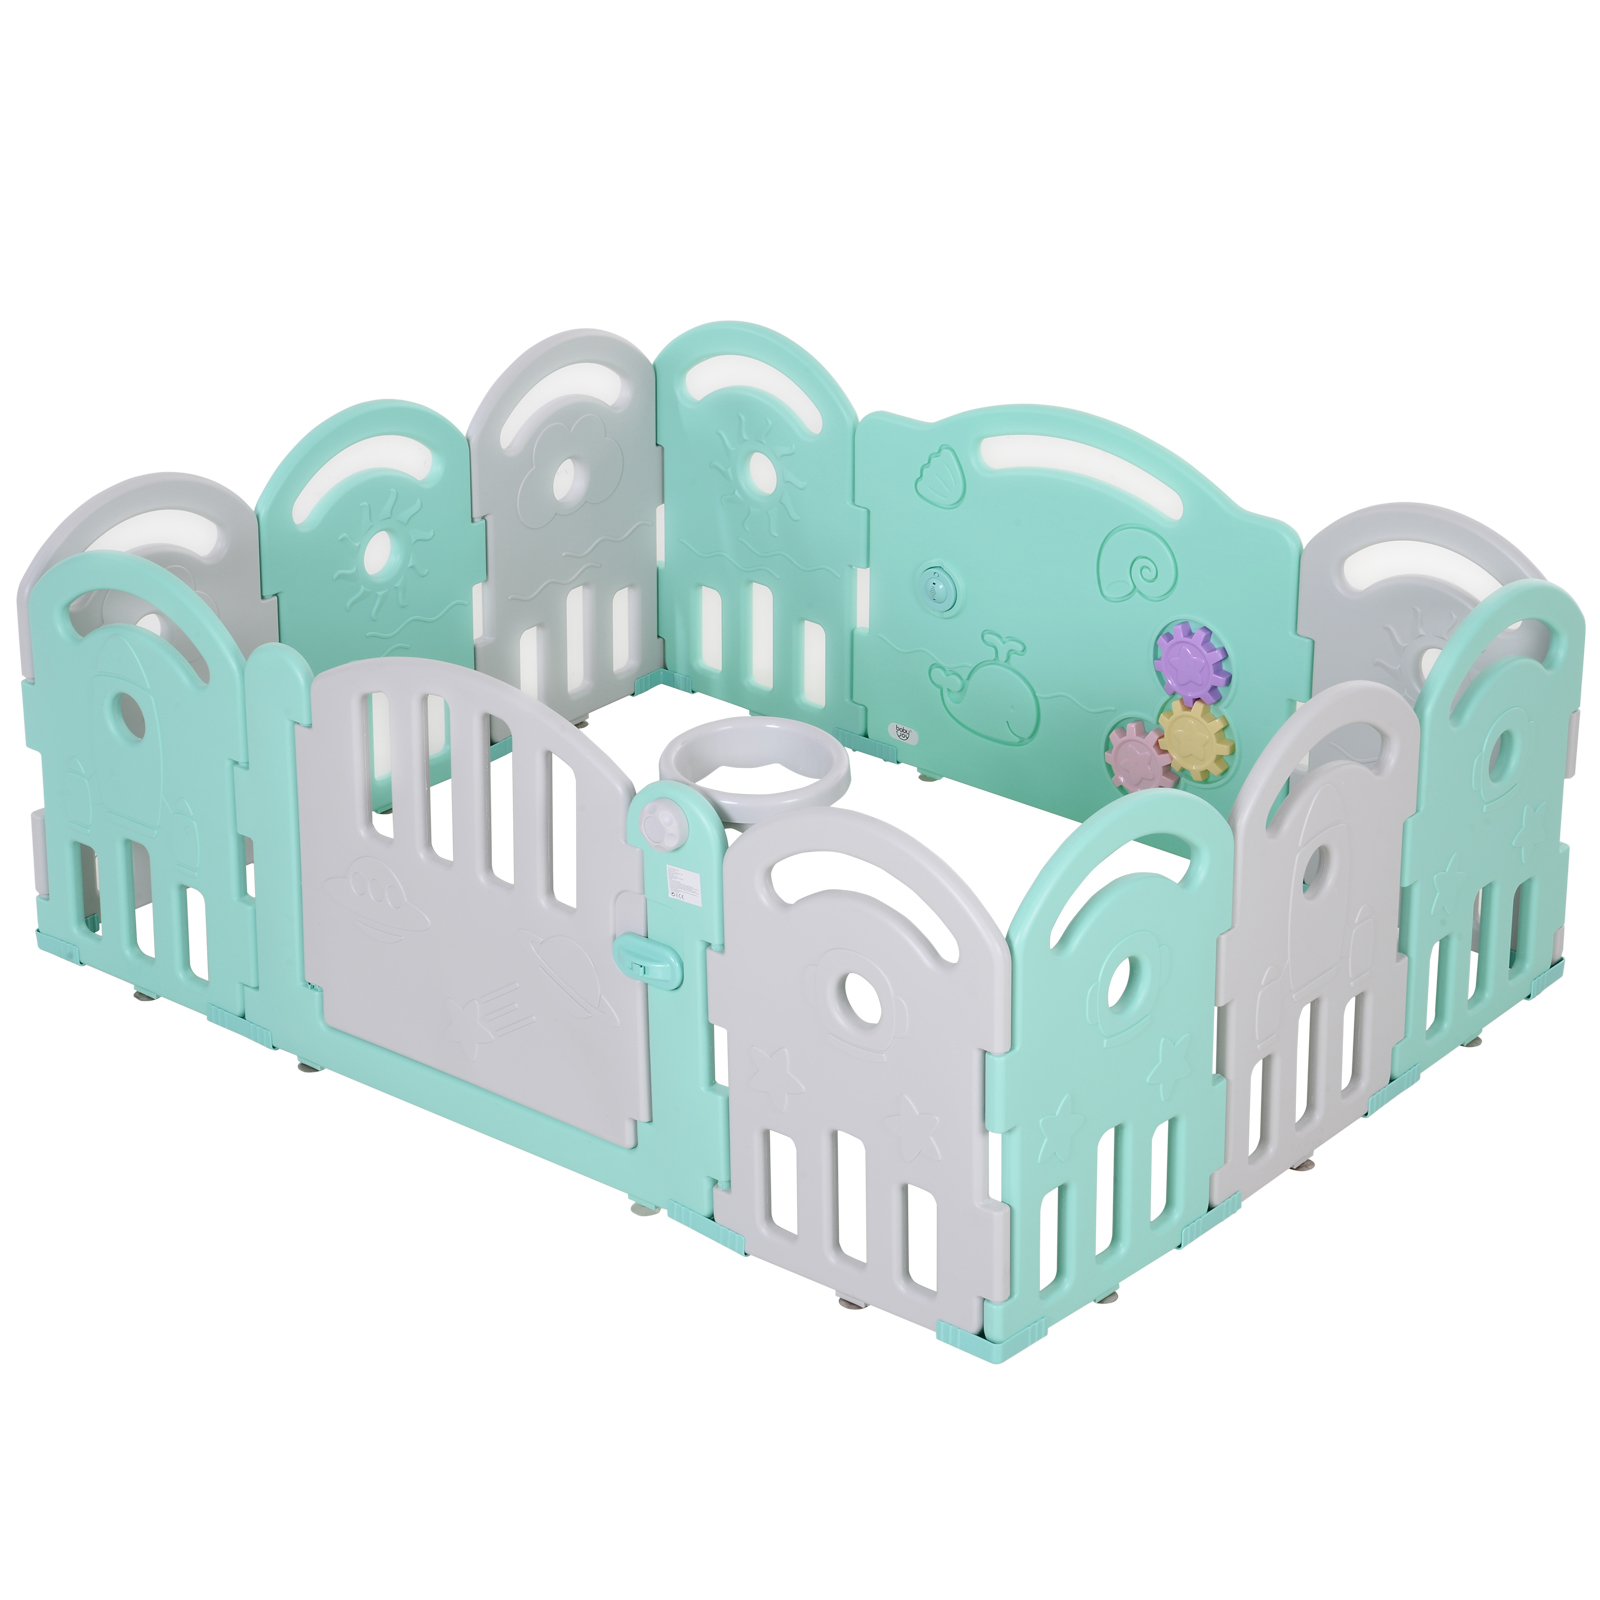 Homcom Gard pentru Copii 6-36 Luni Sigur Colorat Amuzant cu Usa Albastra si Gri 162 x 122 x 63cm imagine aosom.ro